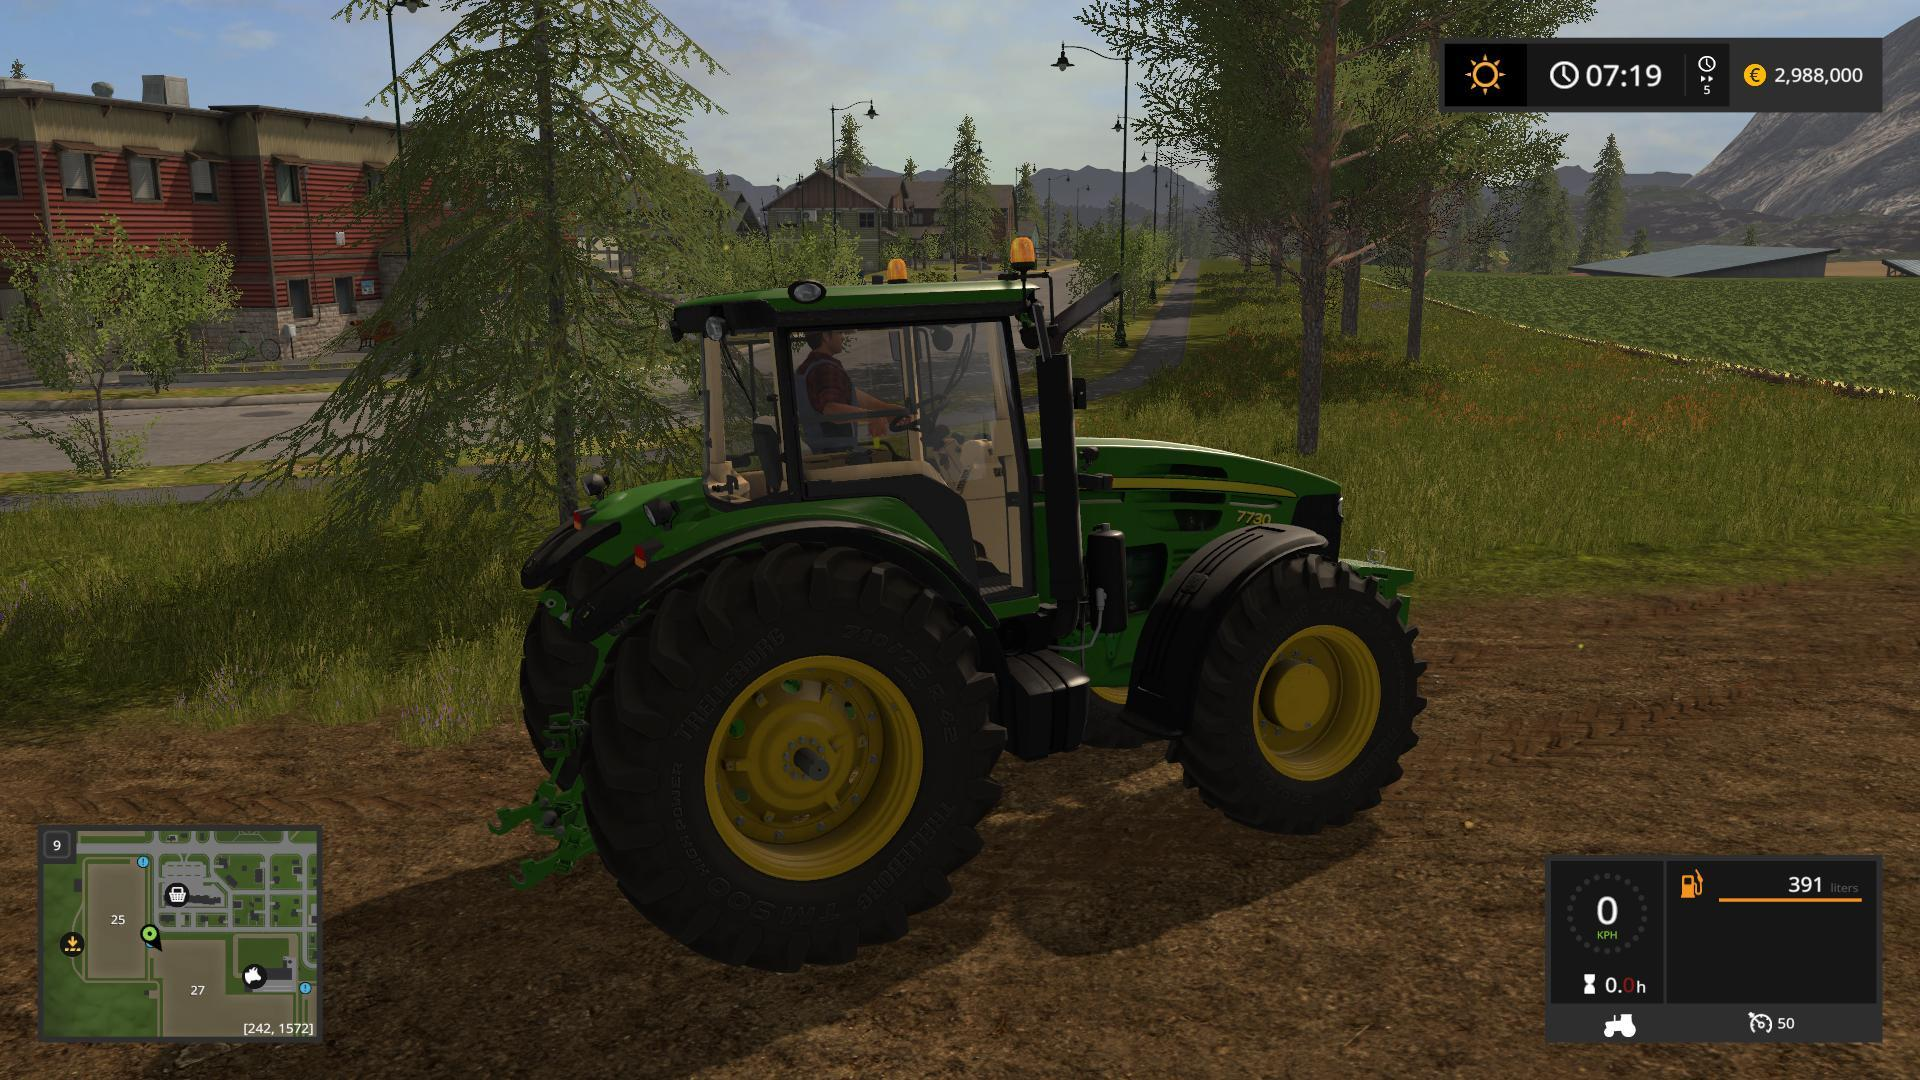 JOHN DEERE 7030 SERIES V2.2.2.0 Tractor - Farming ...